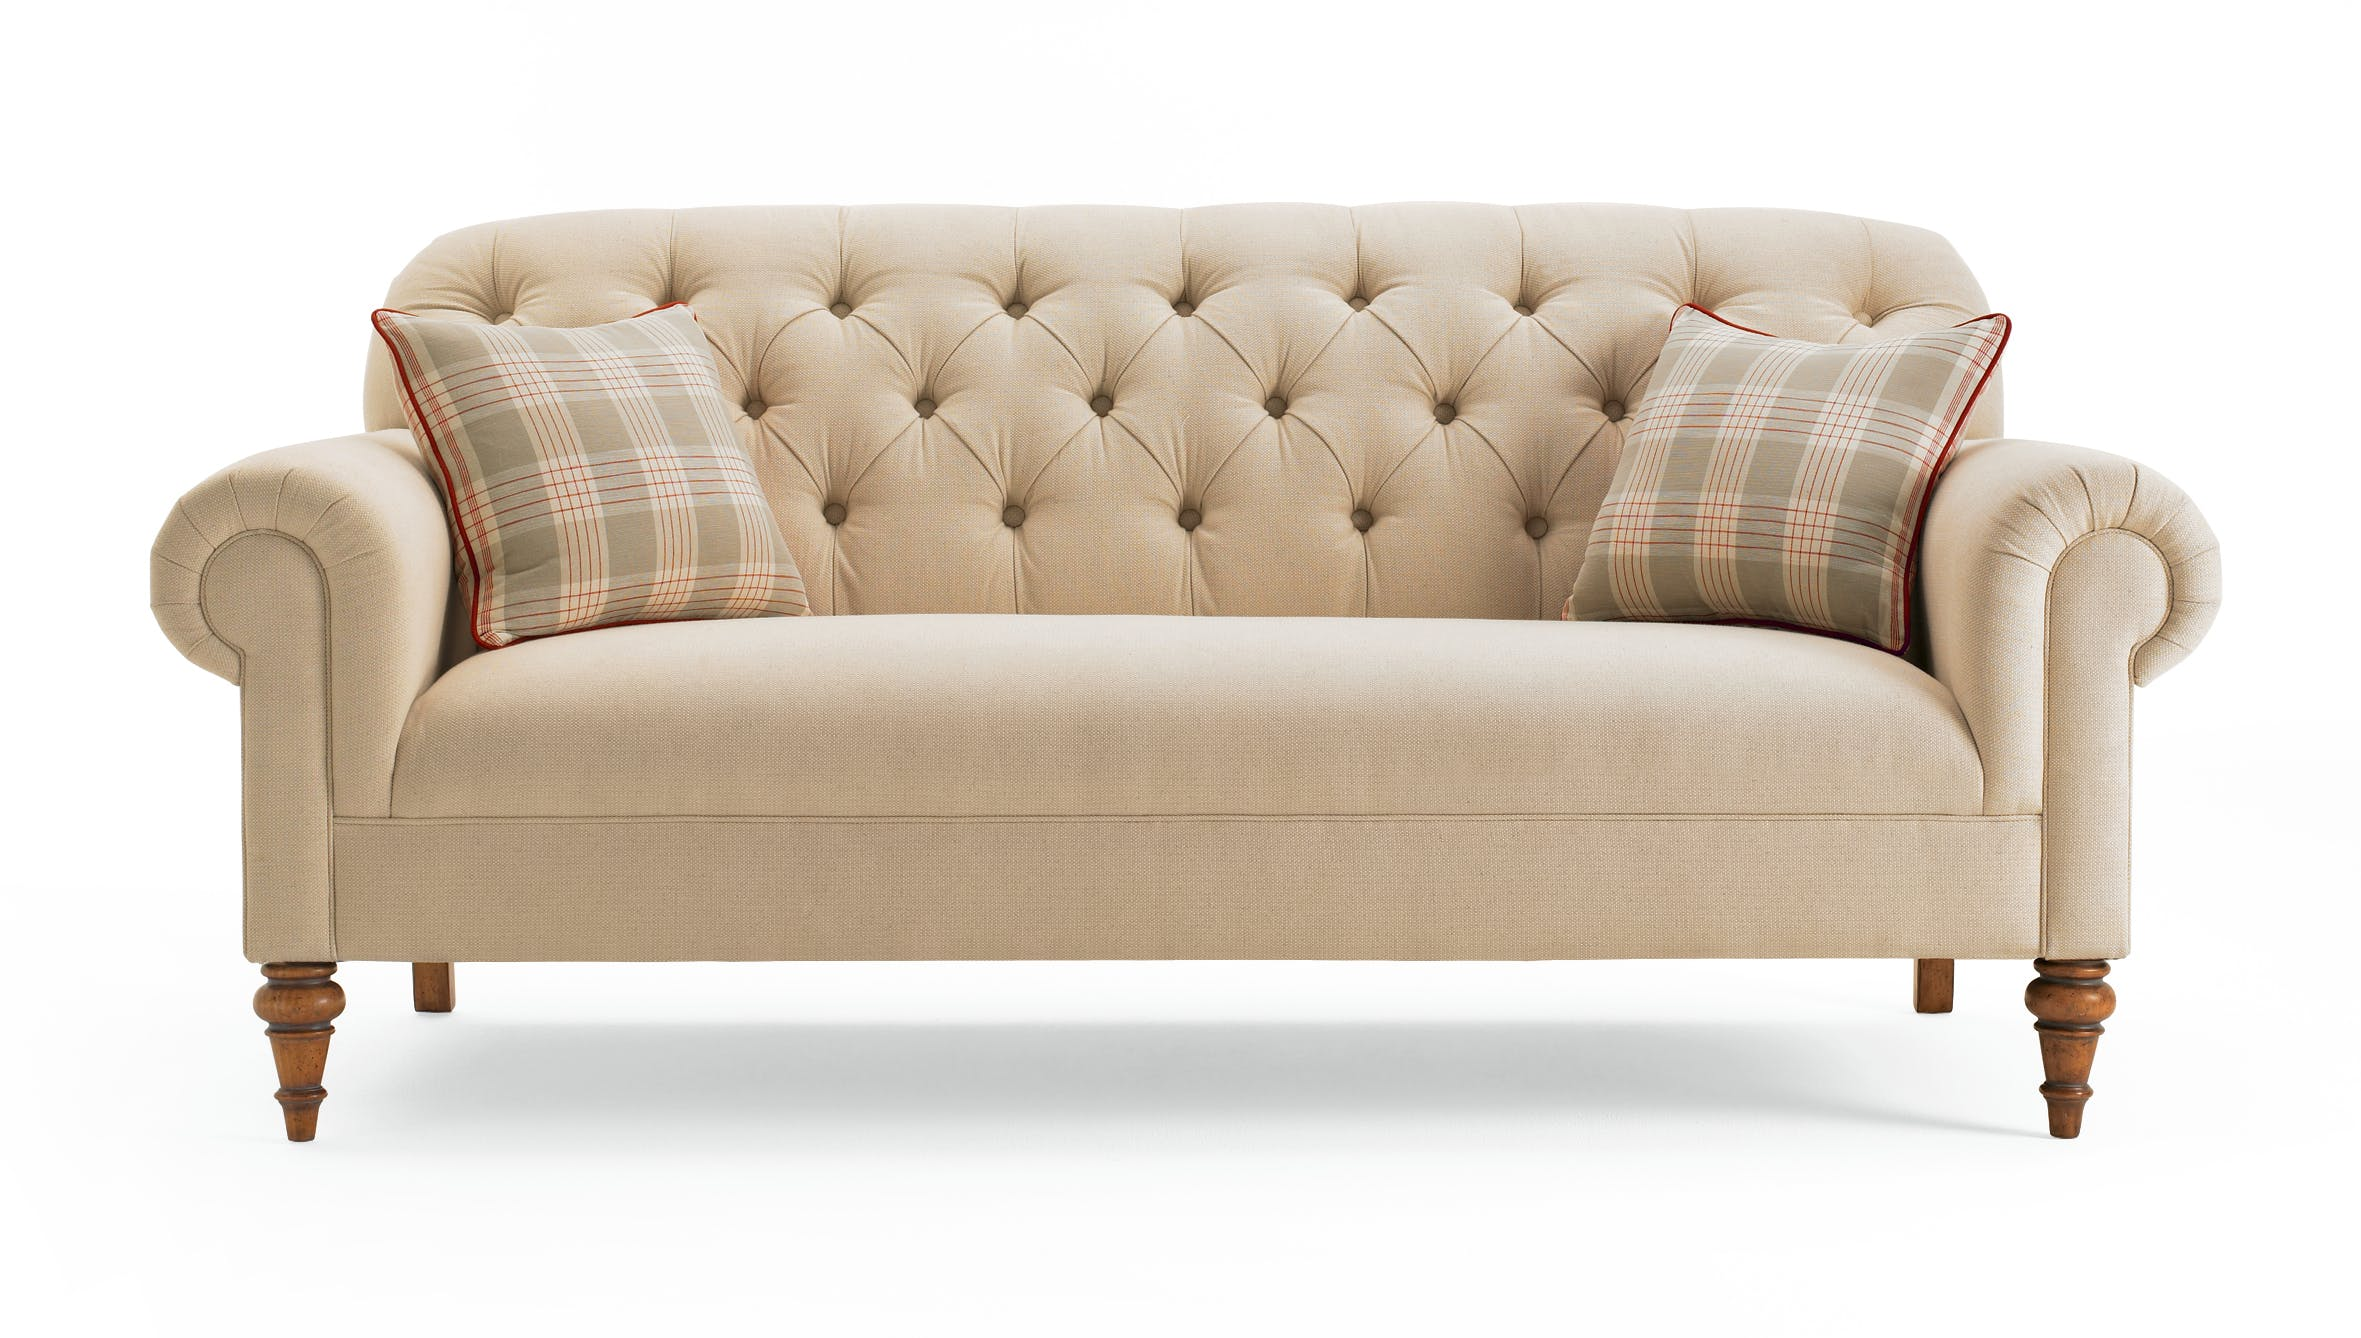 Upholstered sofa schnadig upholstered sofa 4120-082-a from walter e. smithe furniture +  design VFKBODX